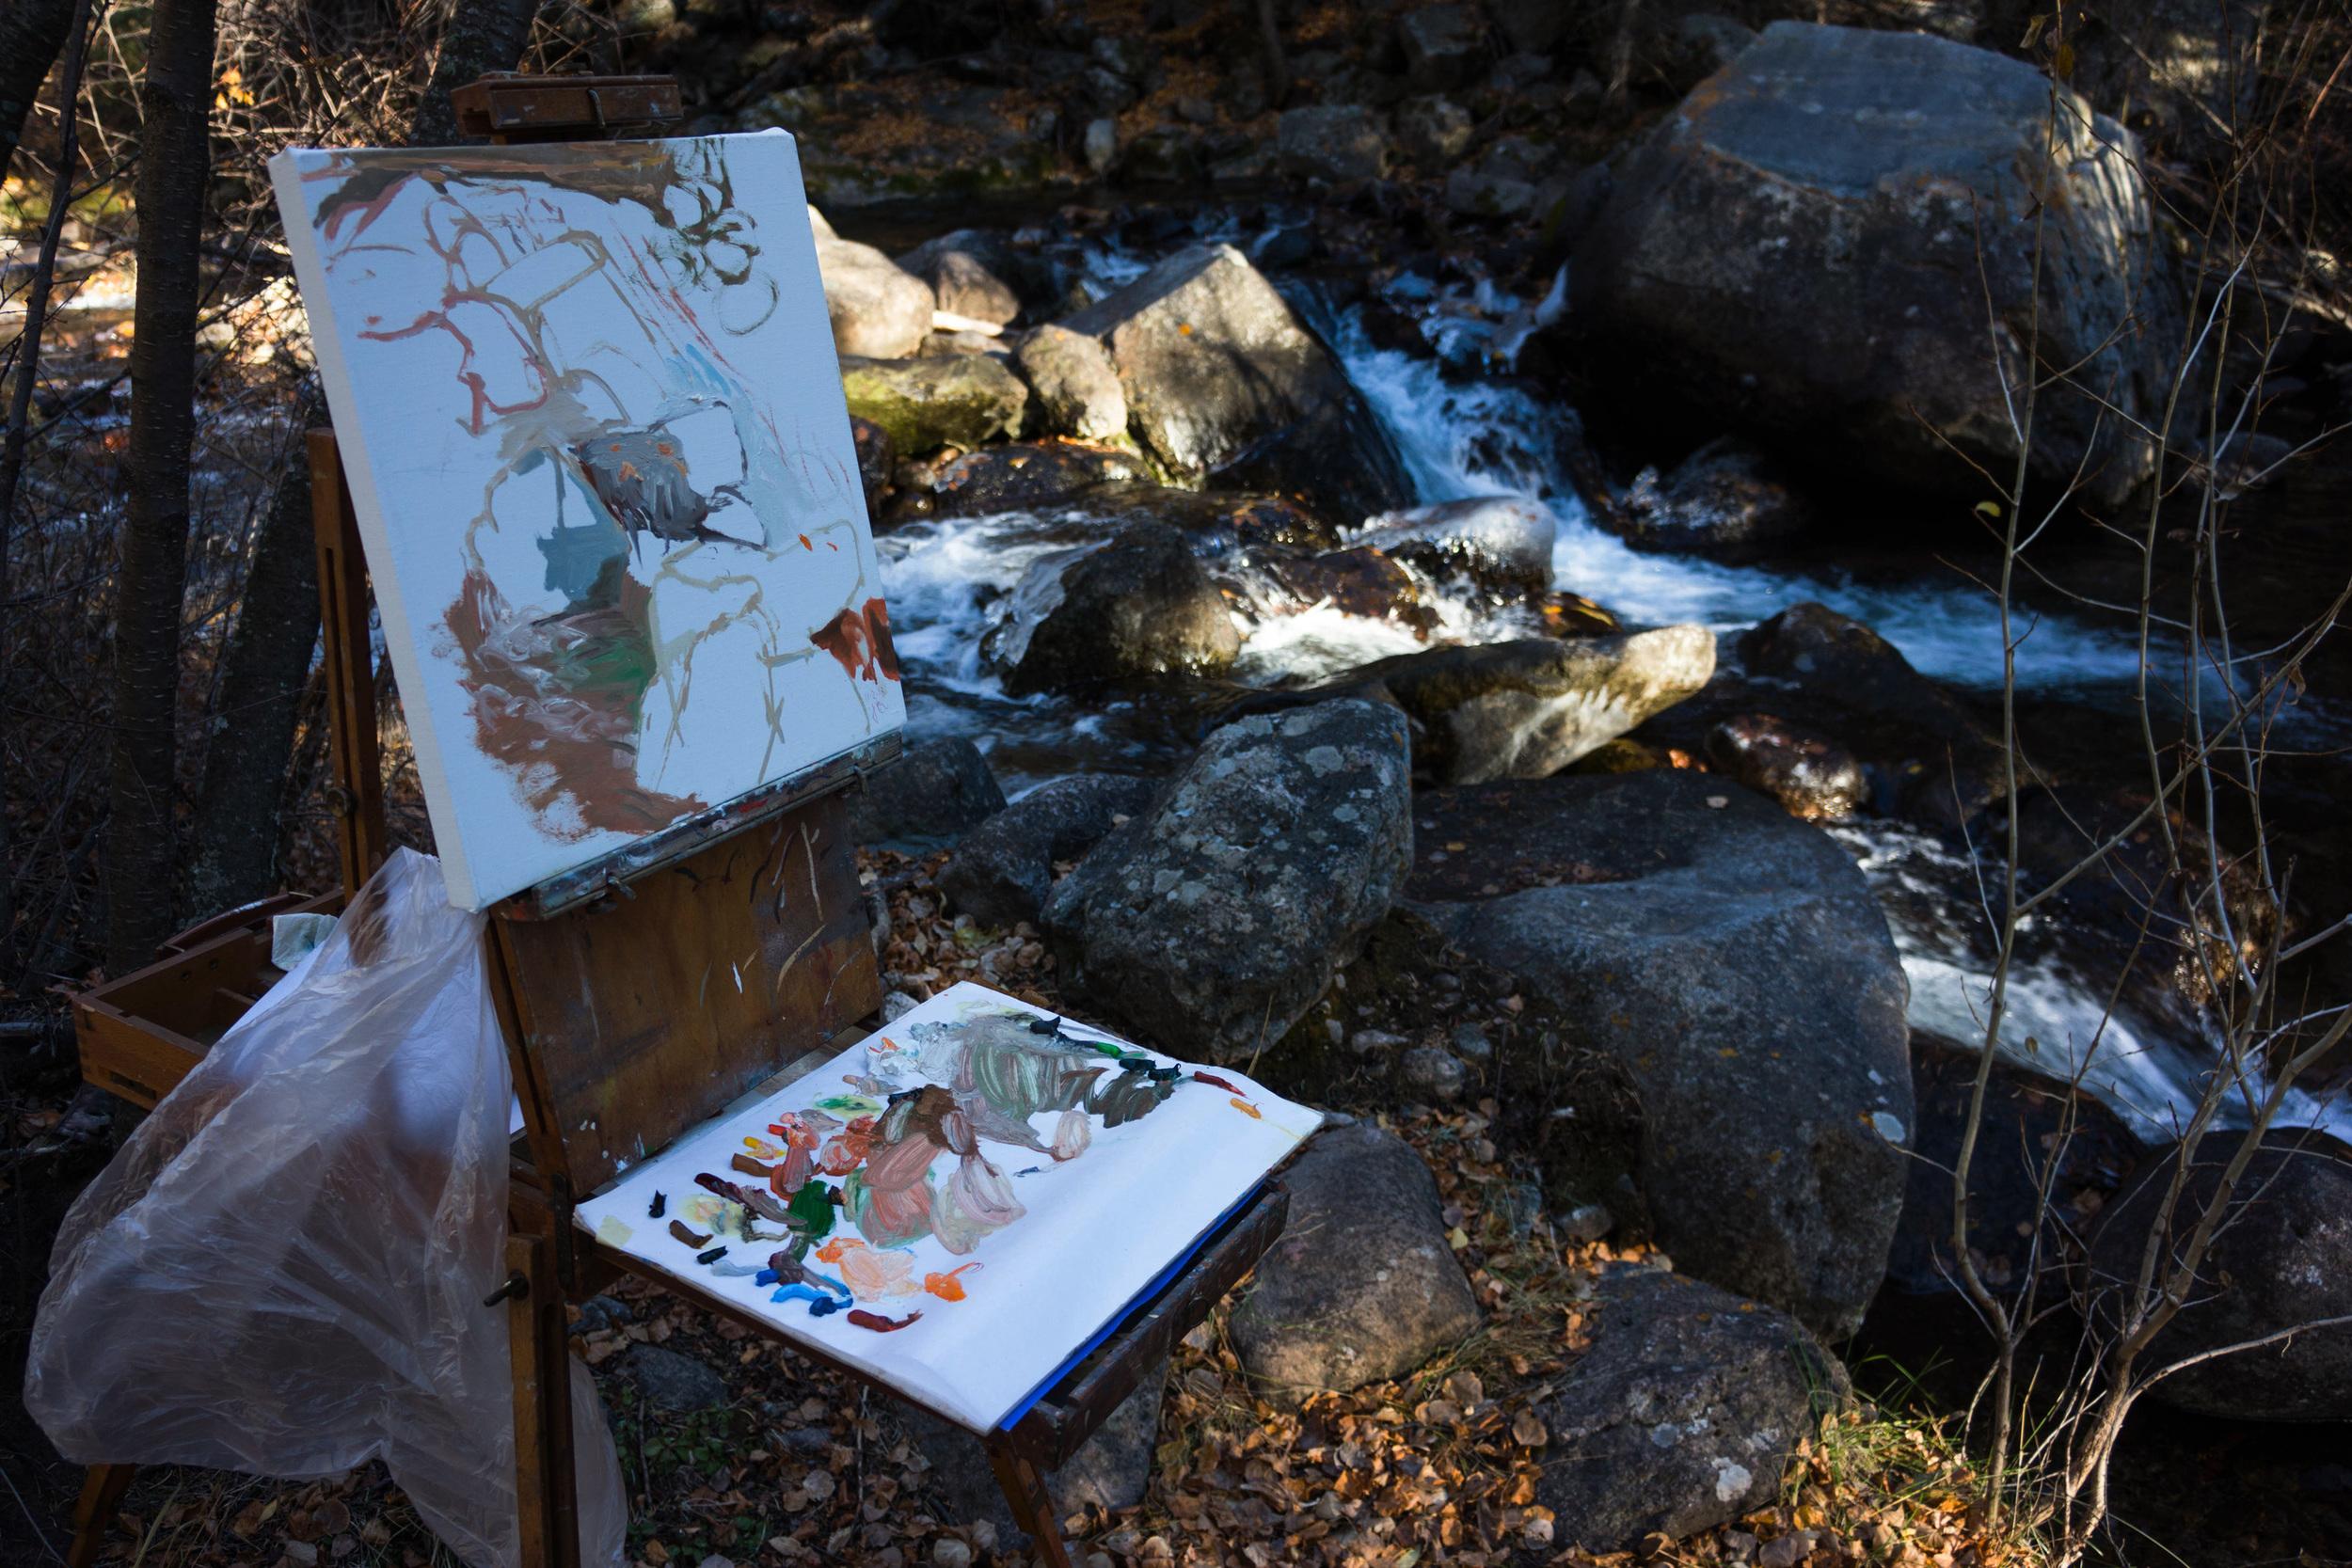 site-11.02.13 LR-RAW n. crestone creek scene 2 16x16.jpg